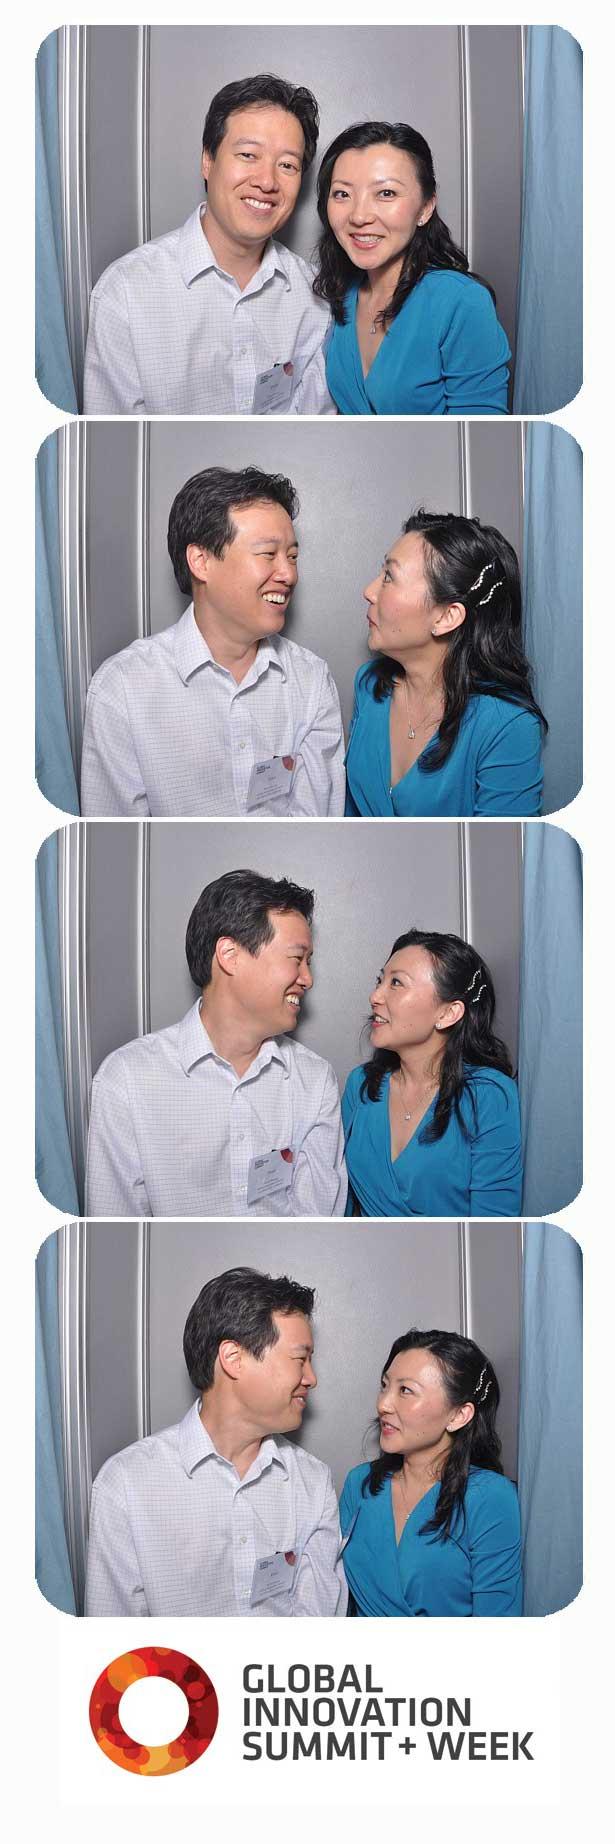 photo-booth-_571.jpg